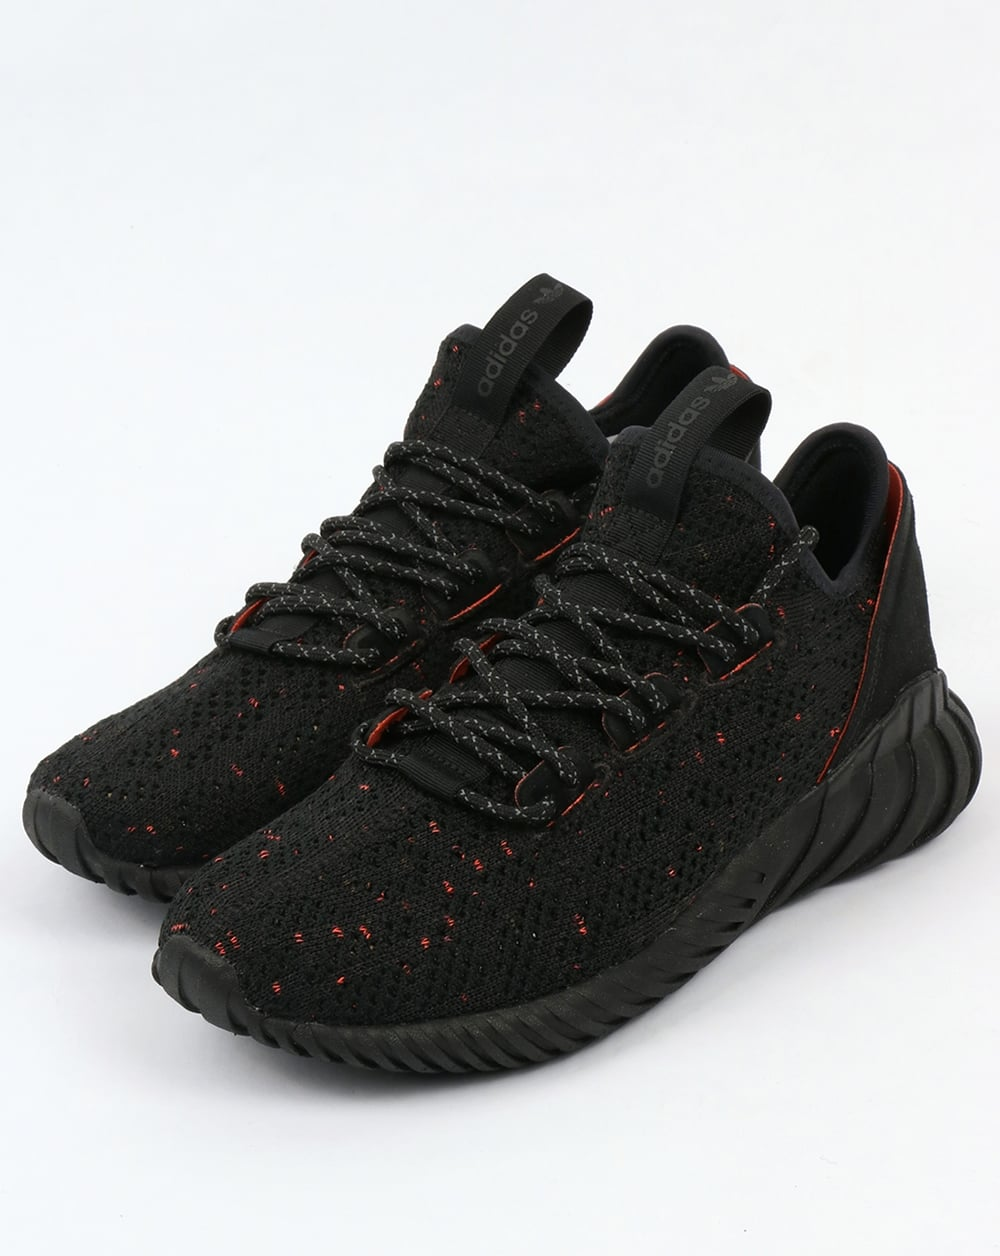 low priced 858c3 5f382 Adidas Tubular Doom Sock Trainers Black/Black/Trace Olive